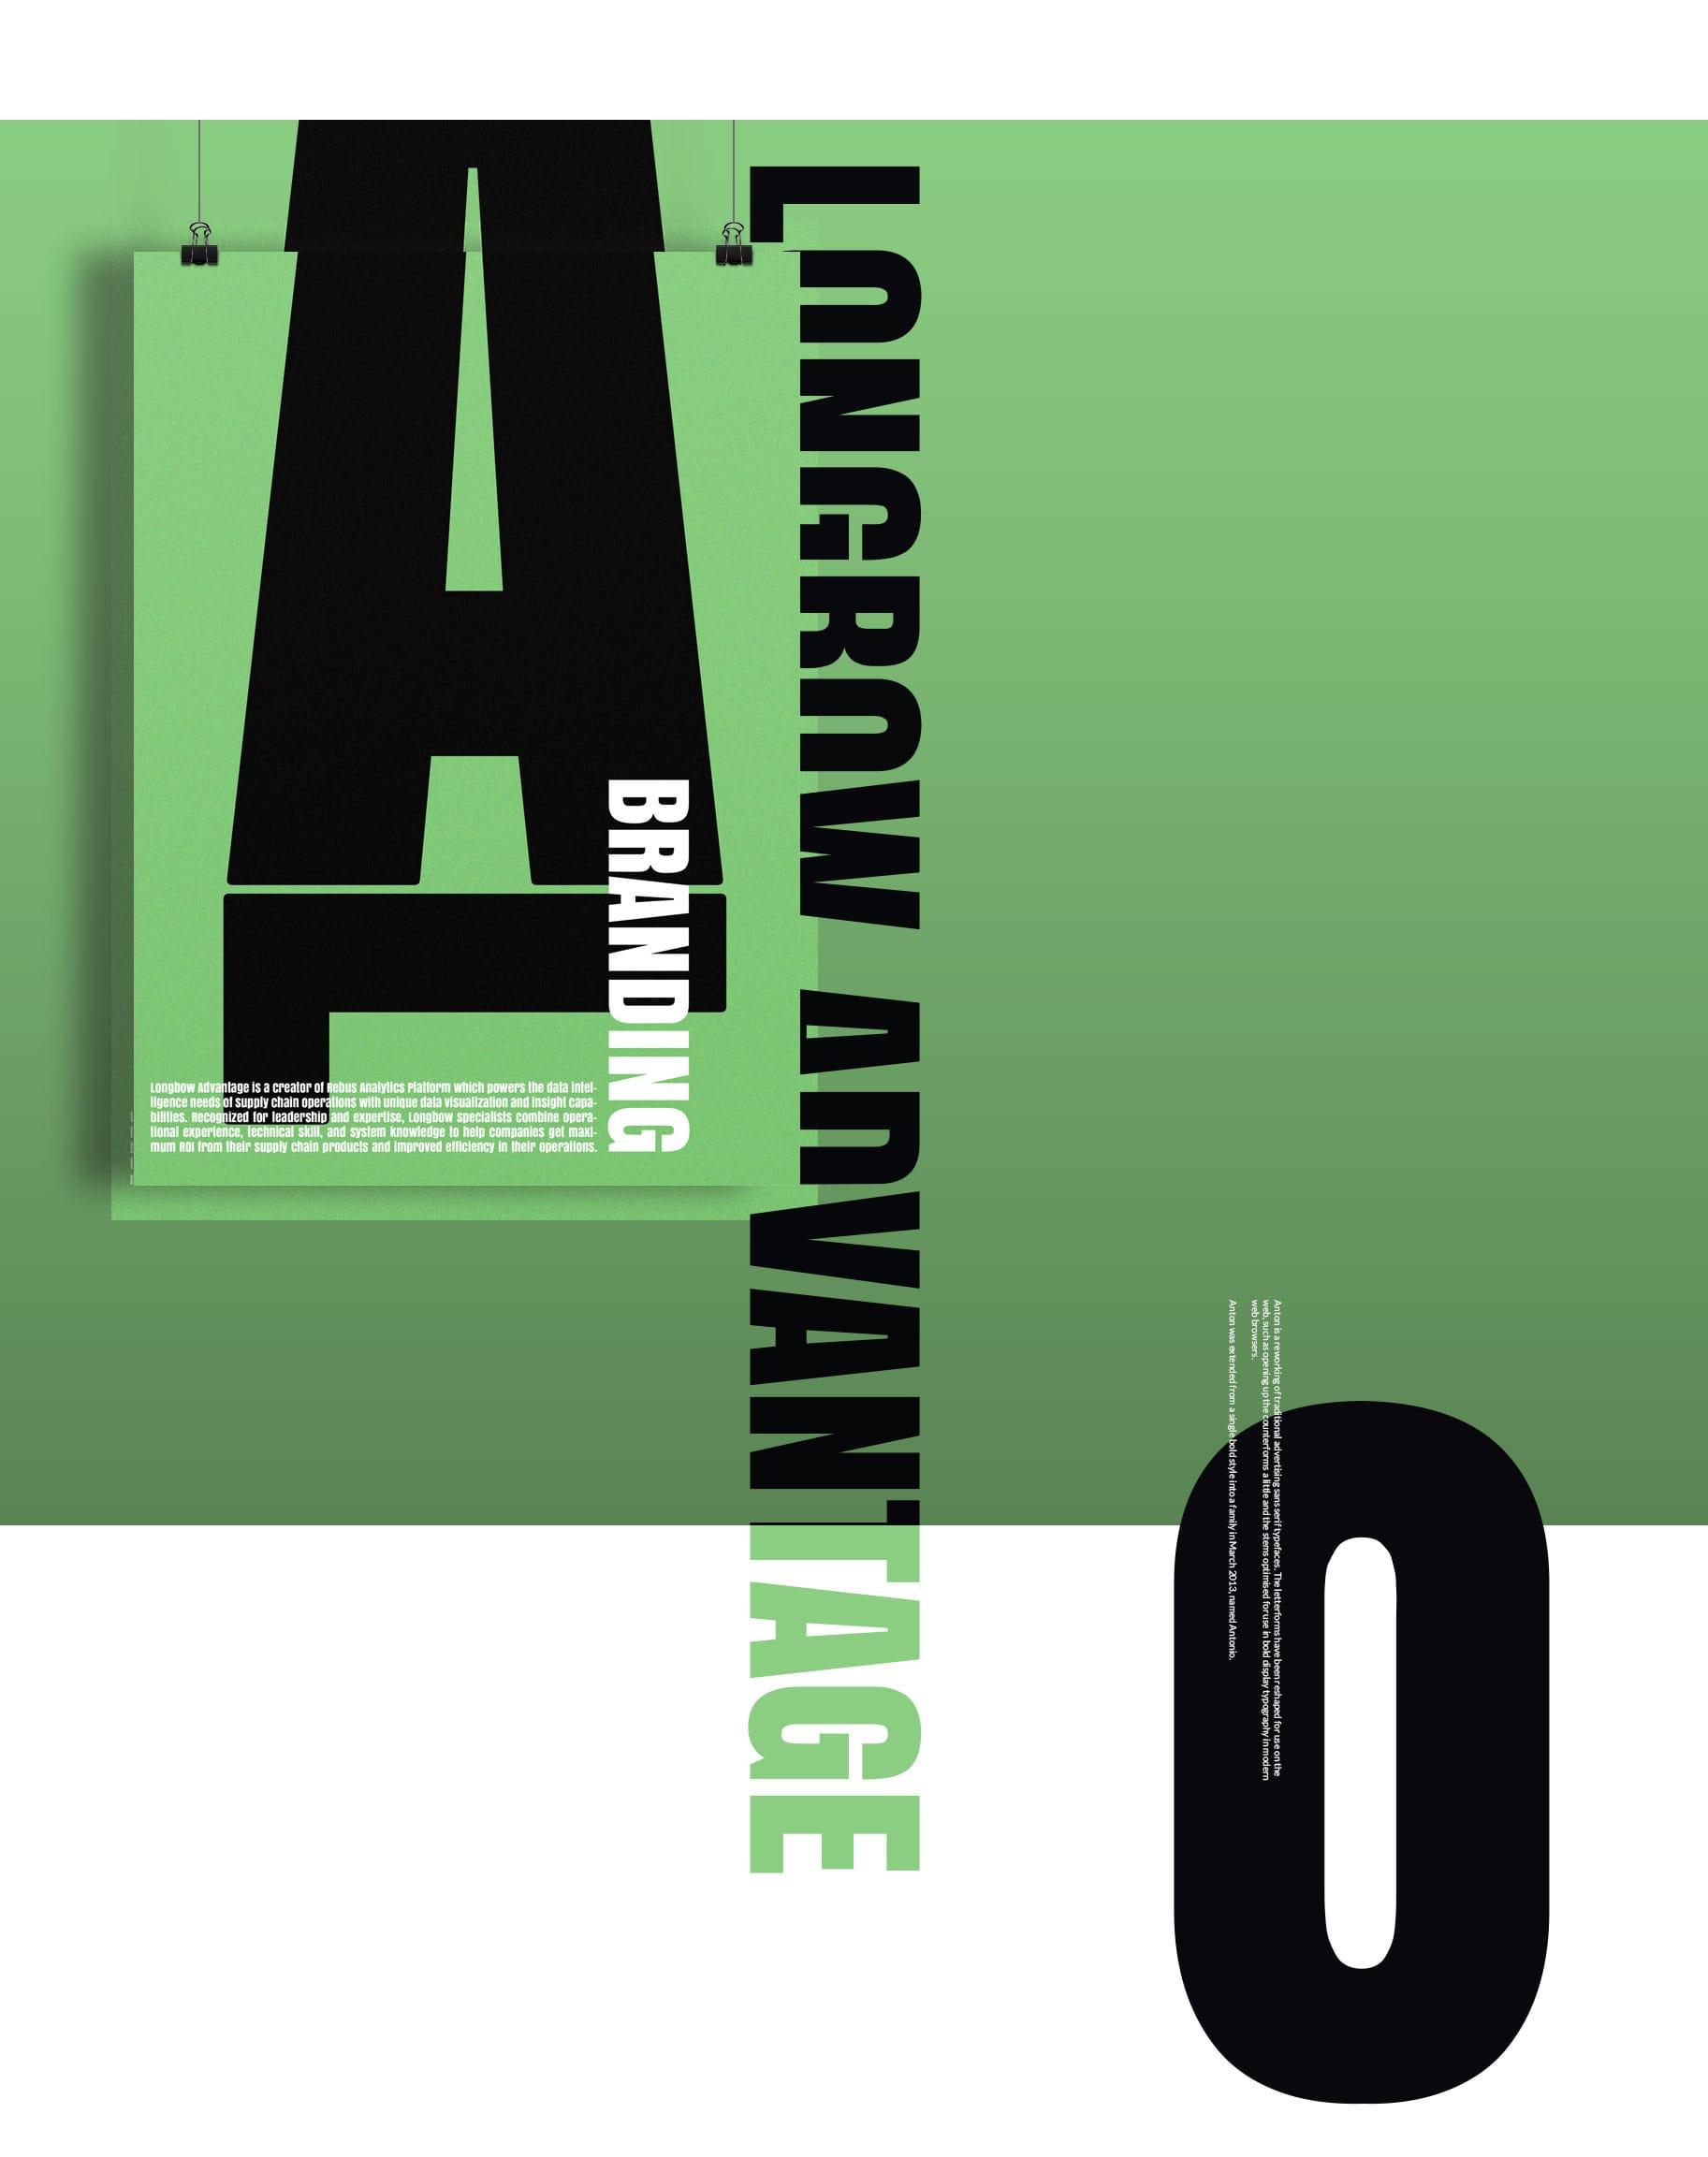 Branding. Poster for Longbow Advantage